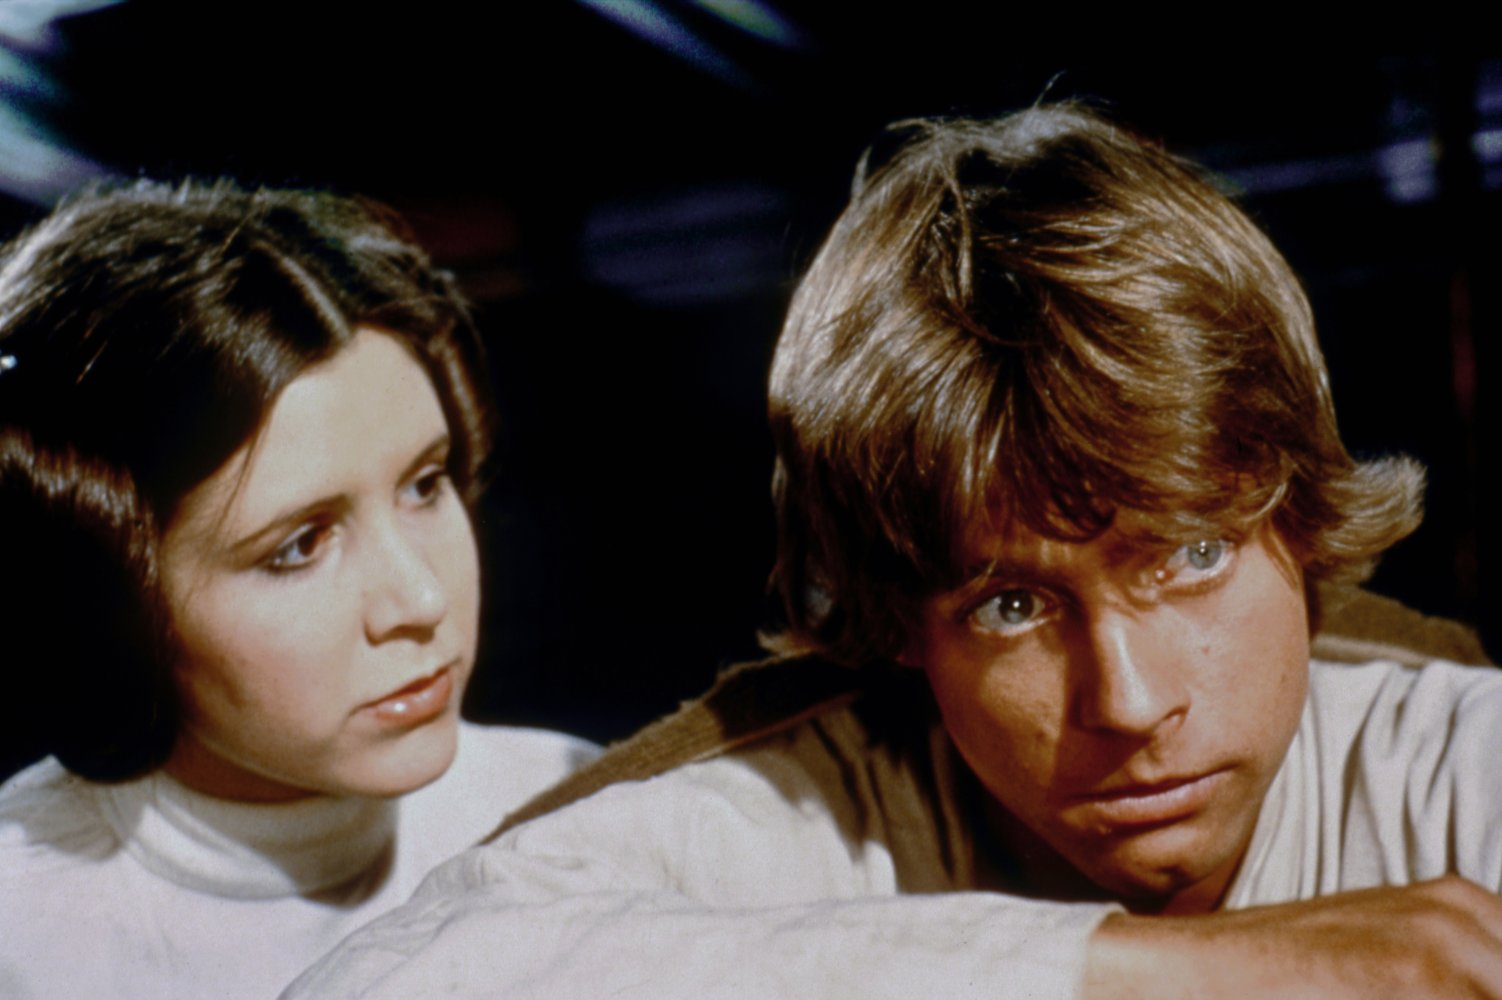 Princess Leia and Luke Skywalker in Star Wars: Episode IV - A New Hope (1977)